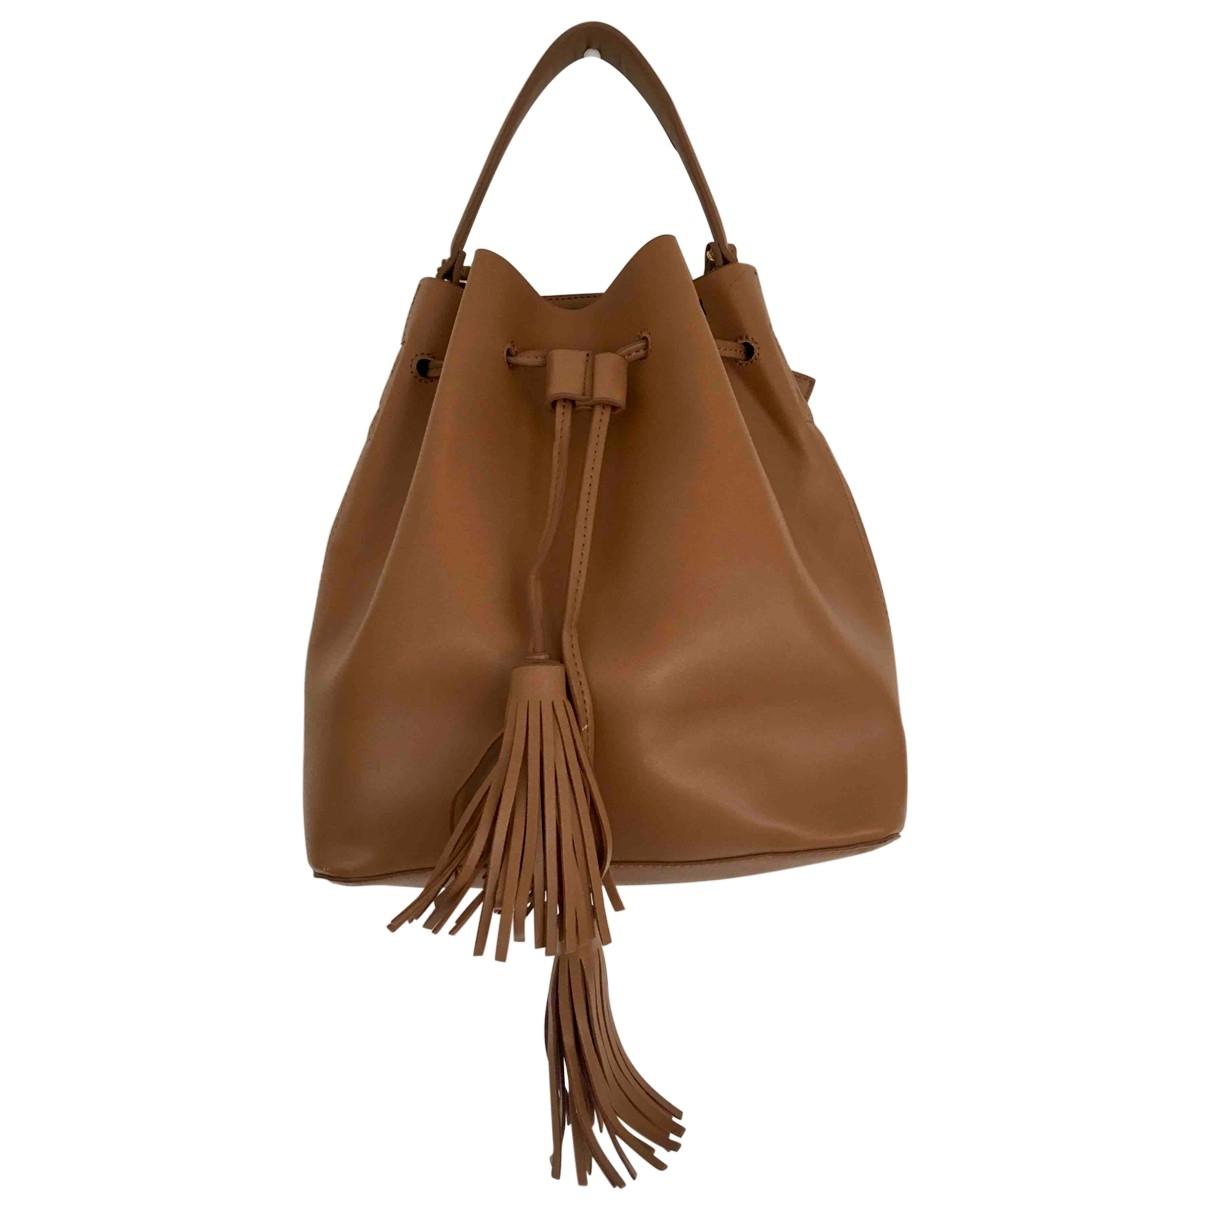 Mango \N Beige handbag for Women \N